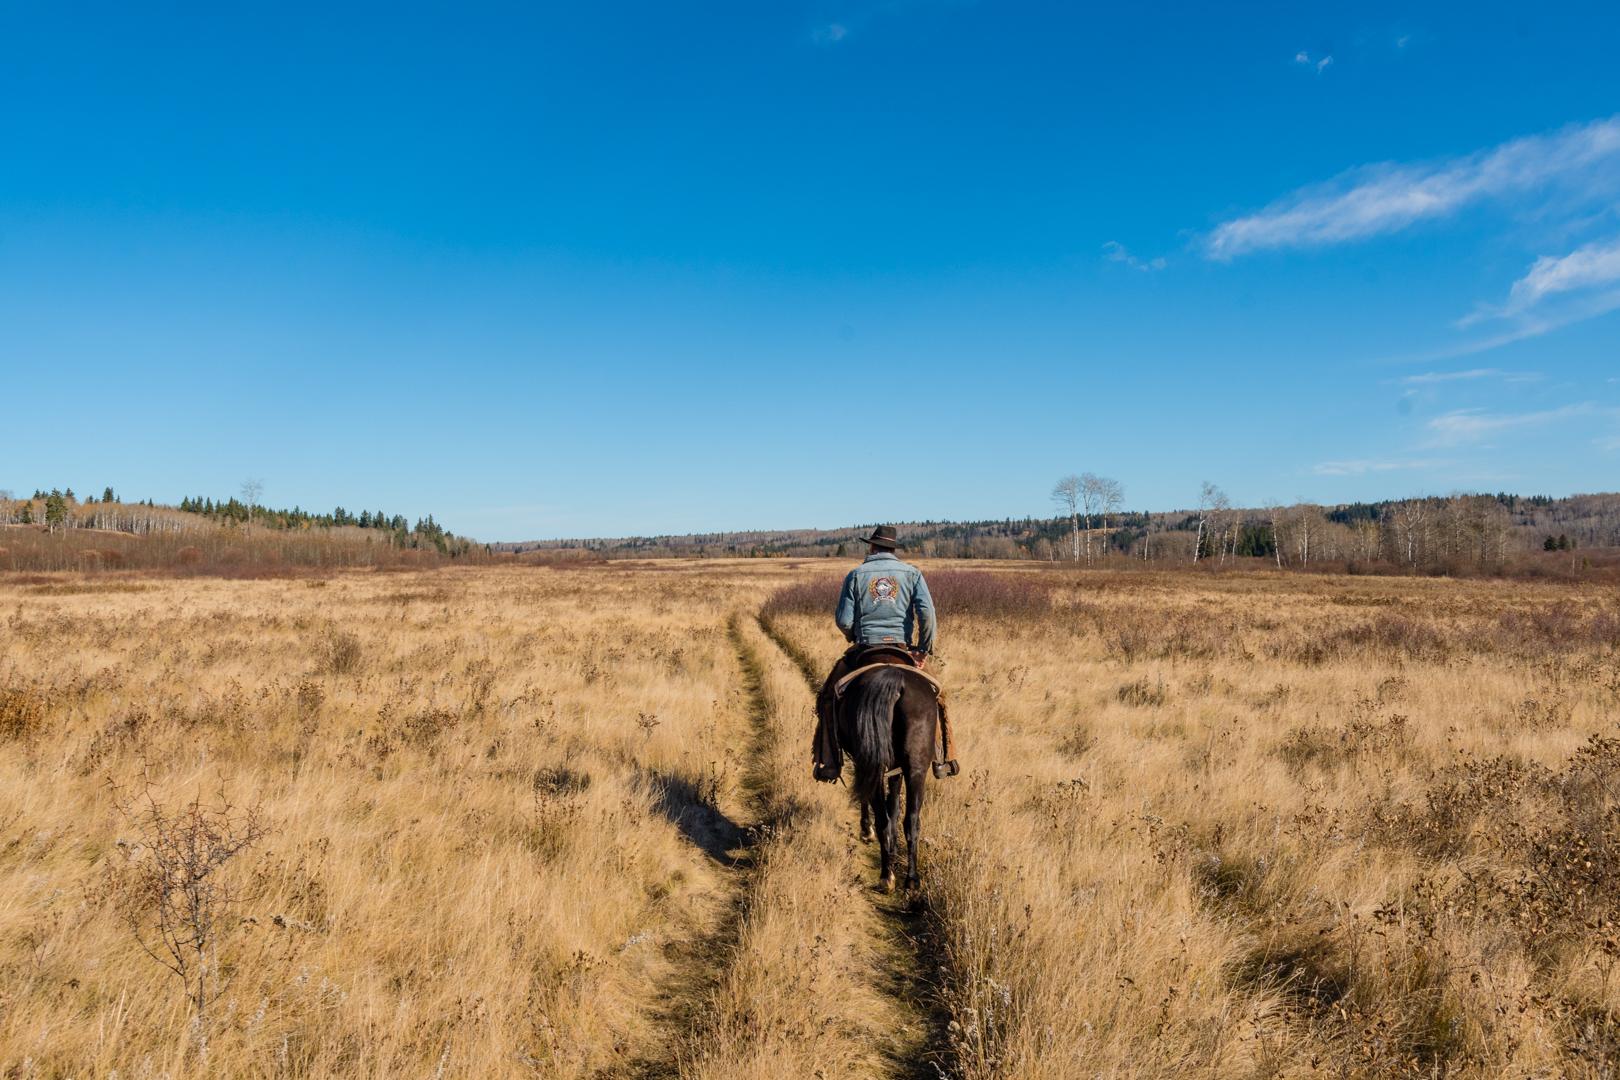 2017 10 16 Riding Mountain-16.jpg